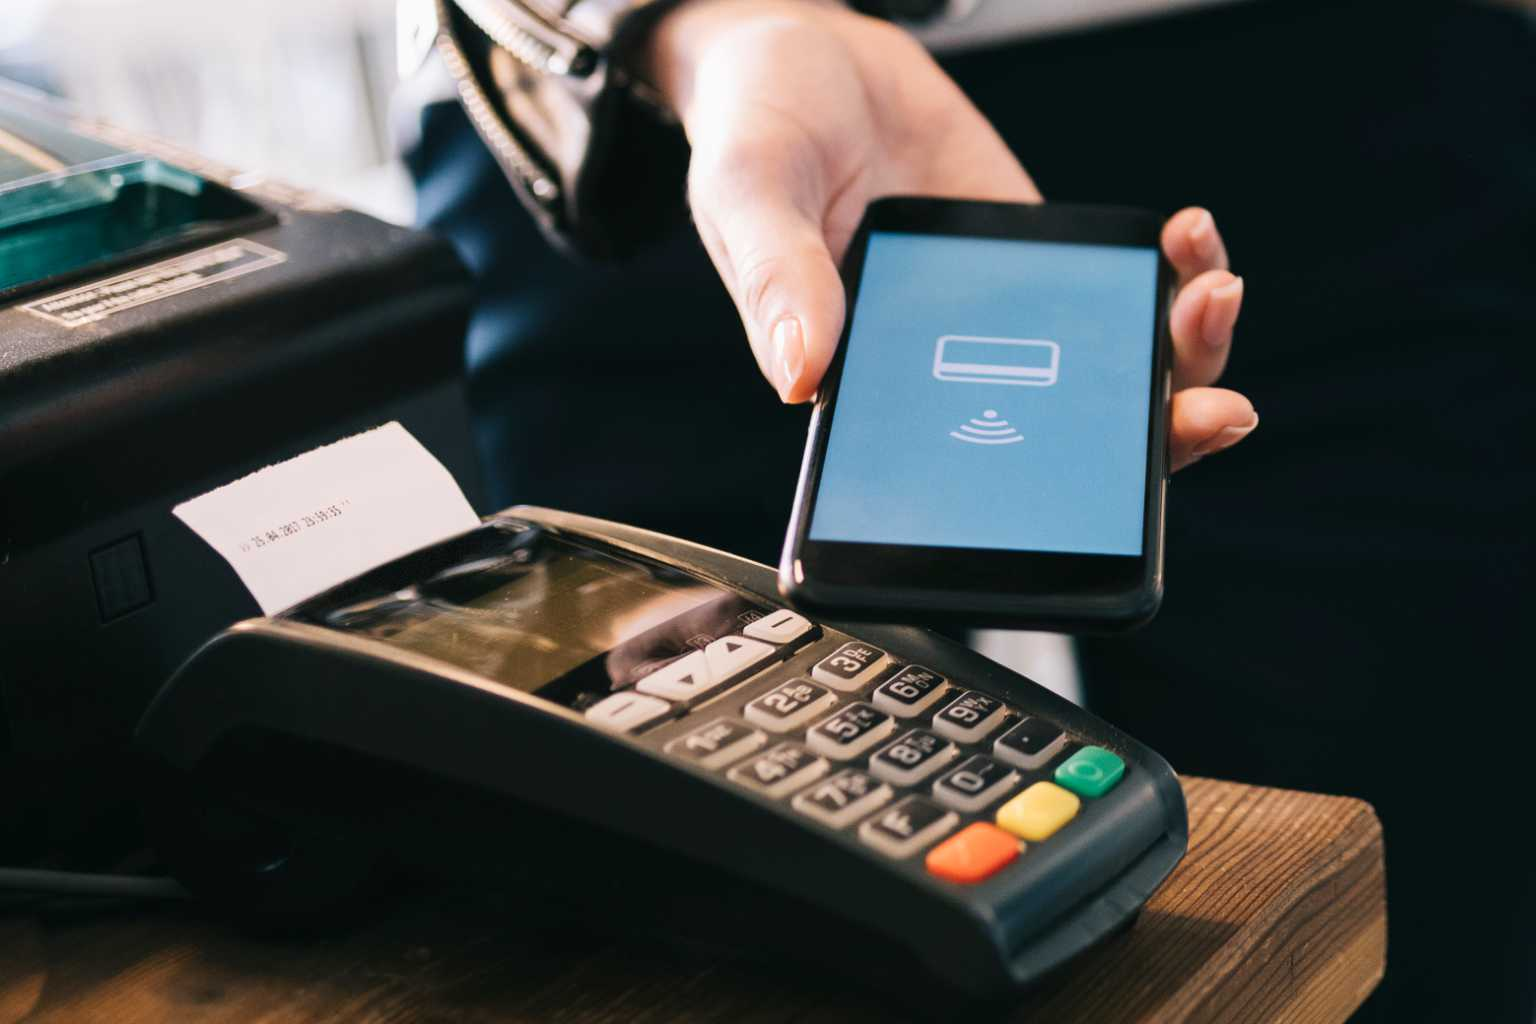 Smartphone creditcard transaction